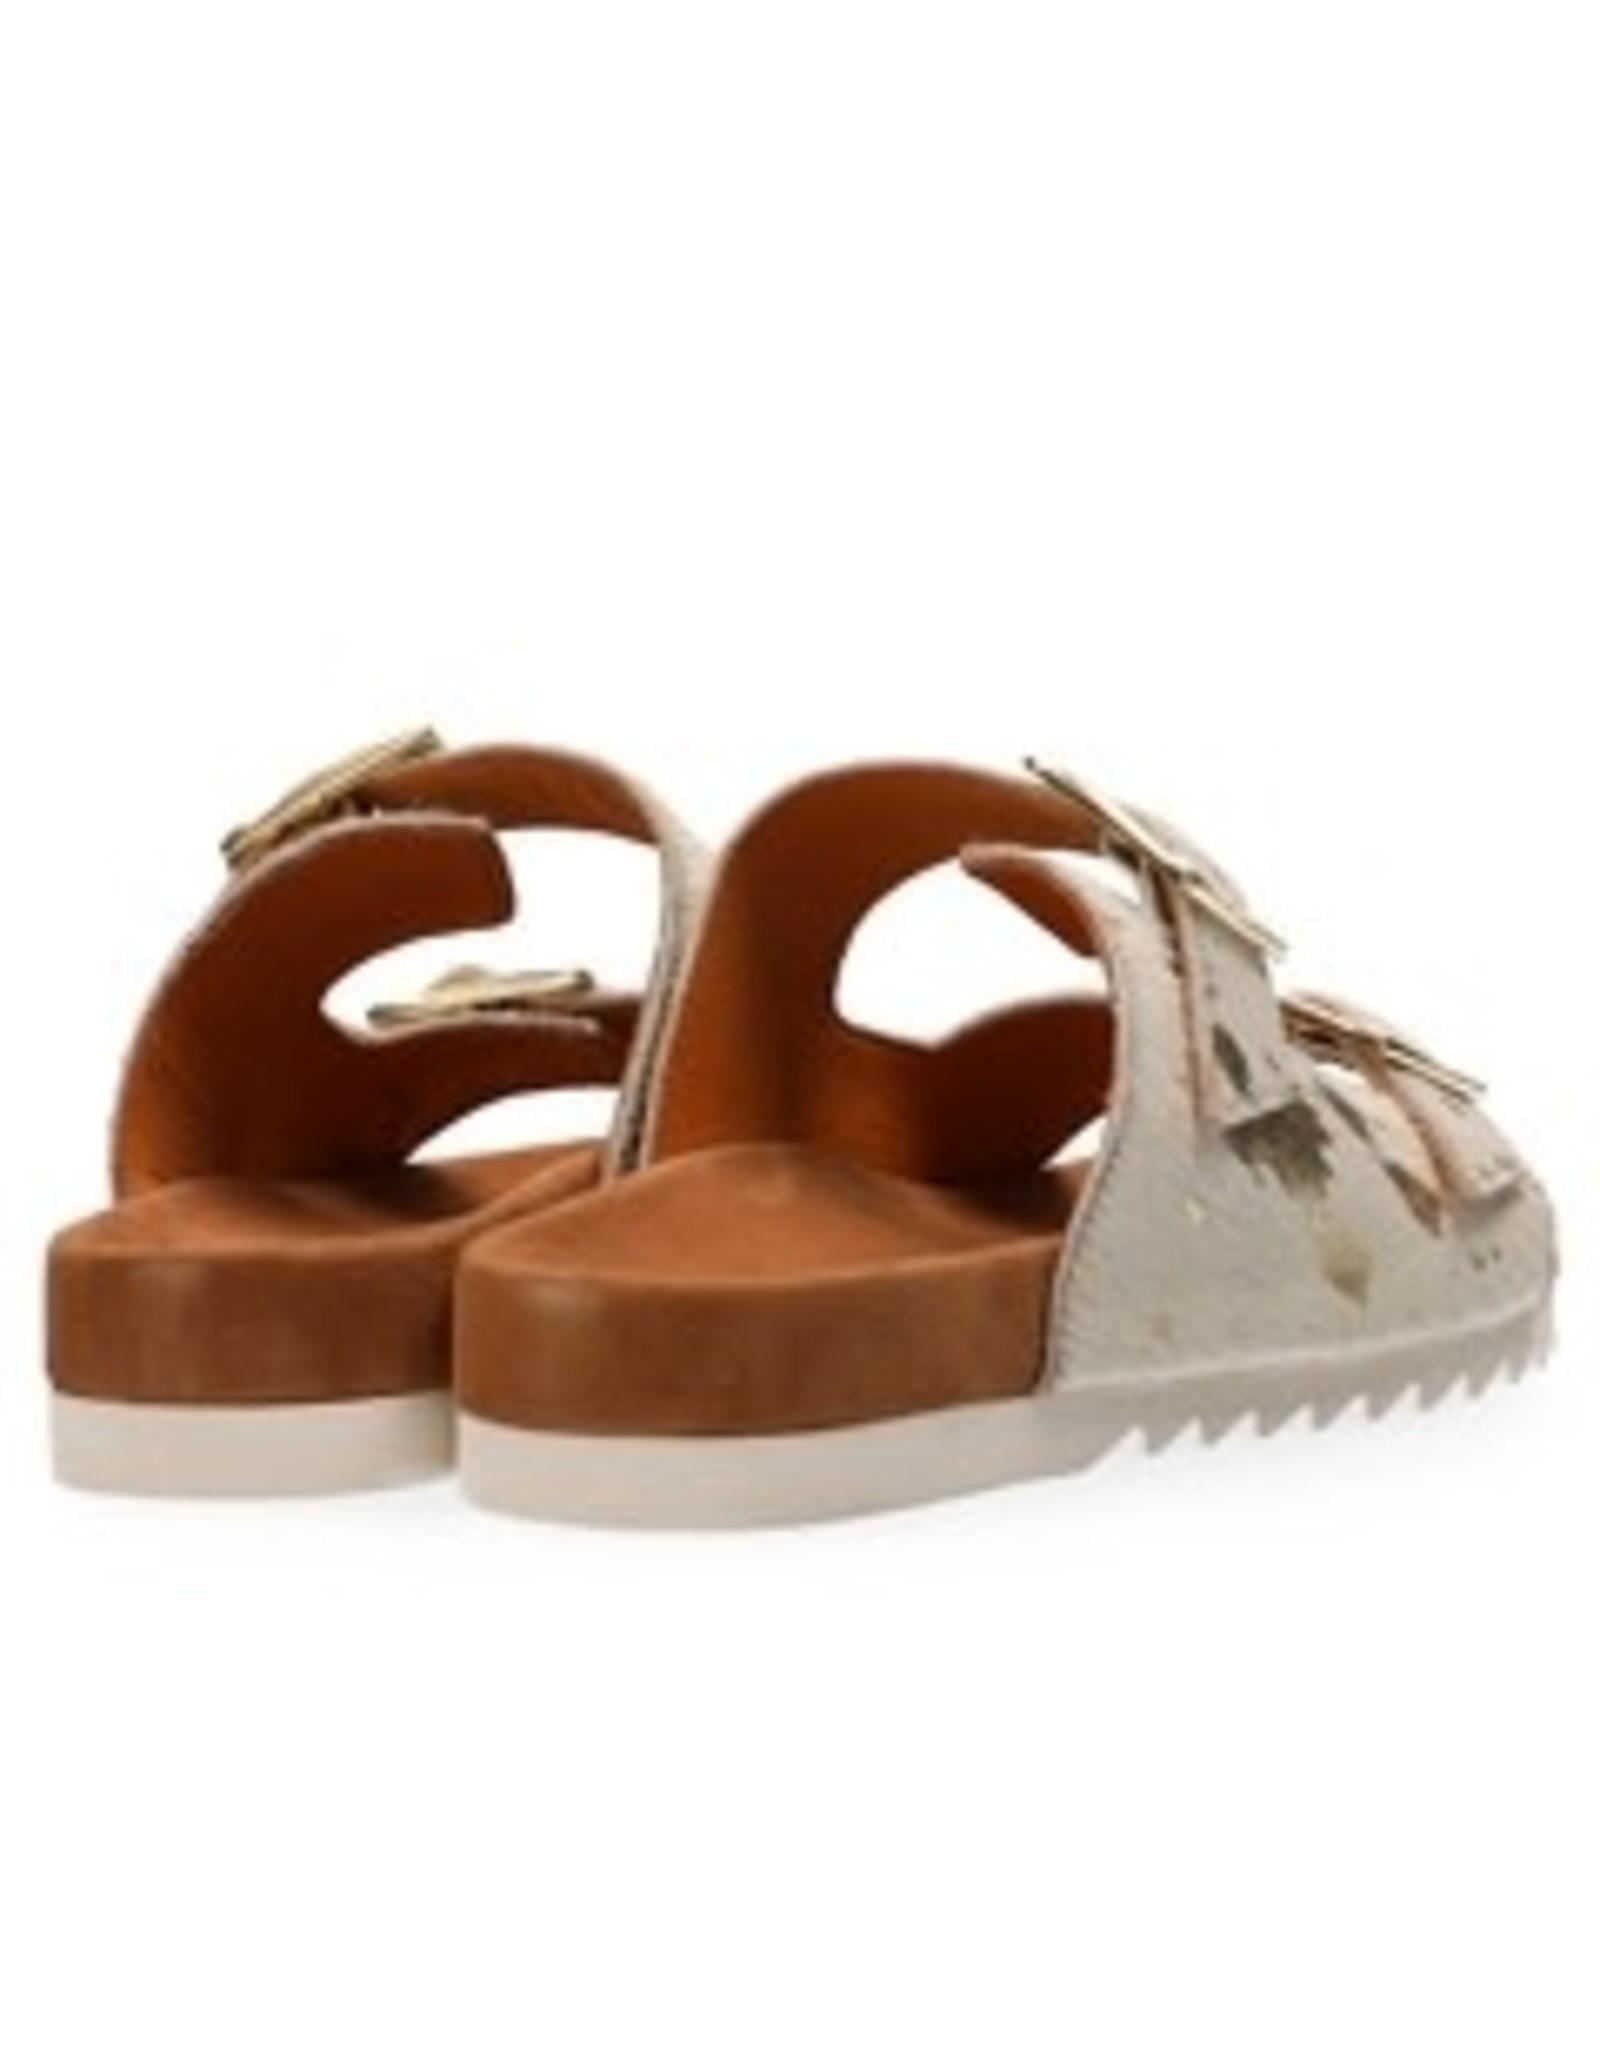 Maruti Bellona Sandal Silver